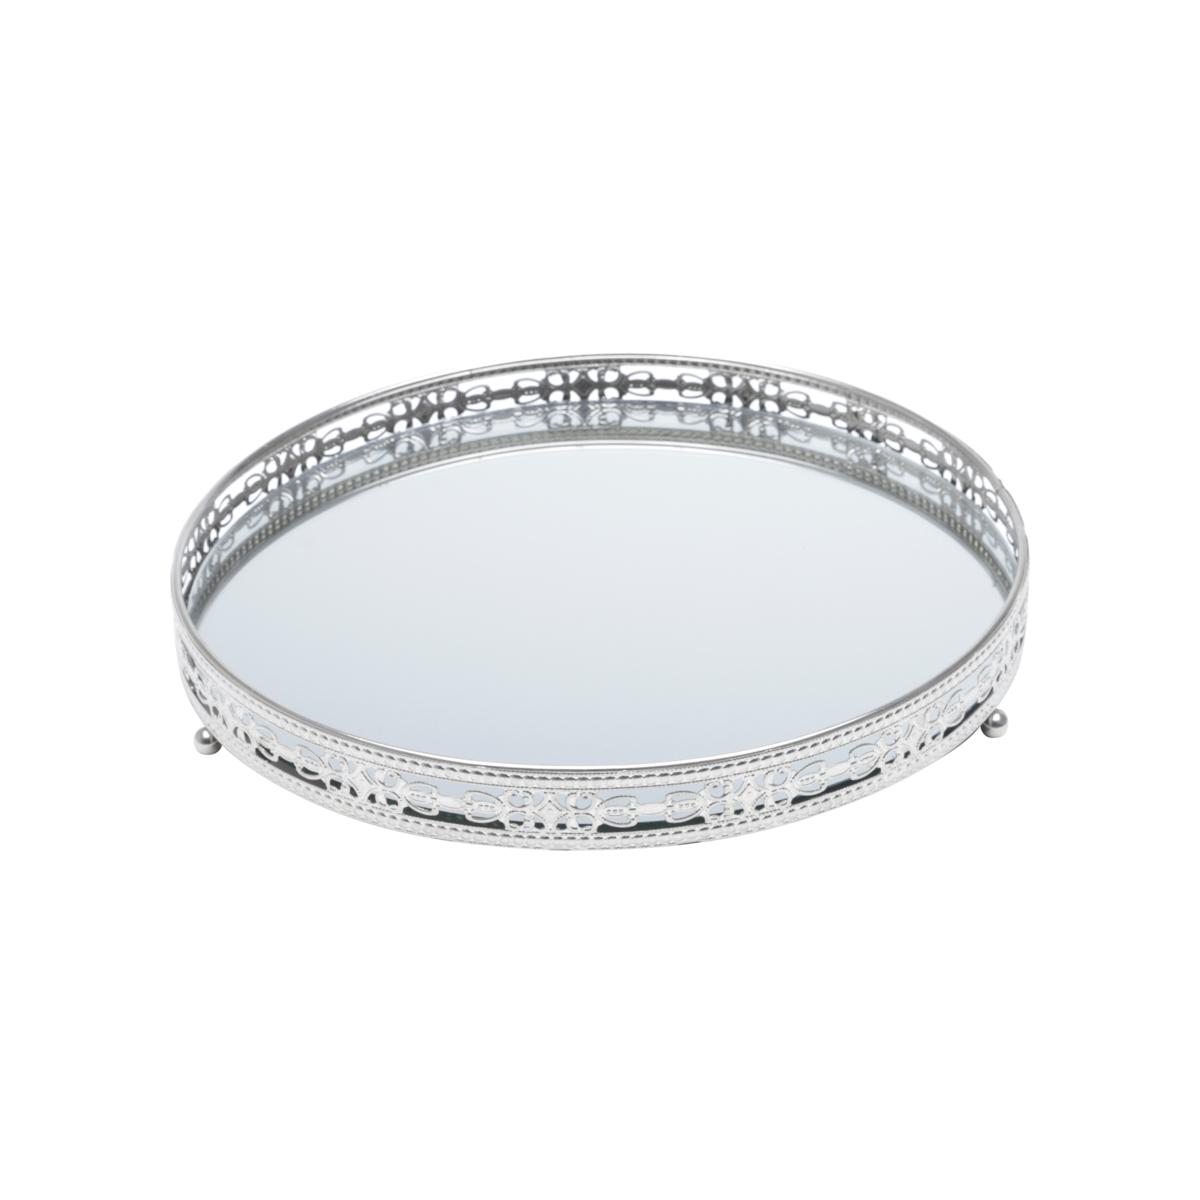 Bandeja ferro c/ espelho Bunch Prata